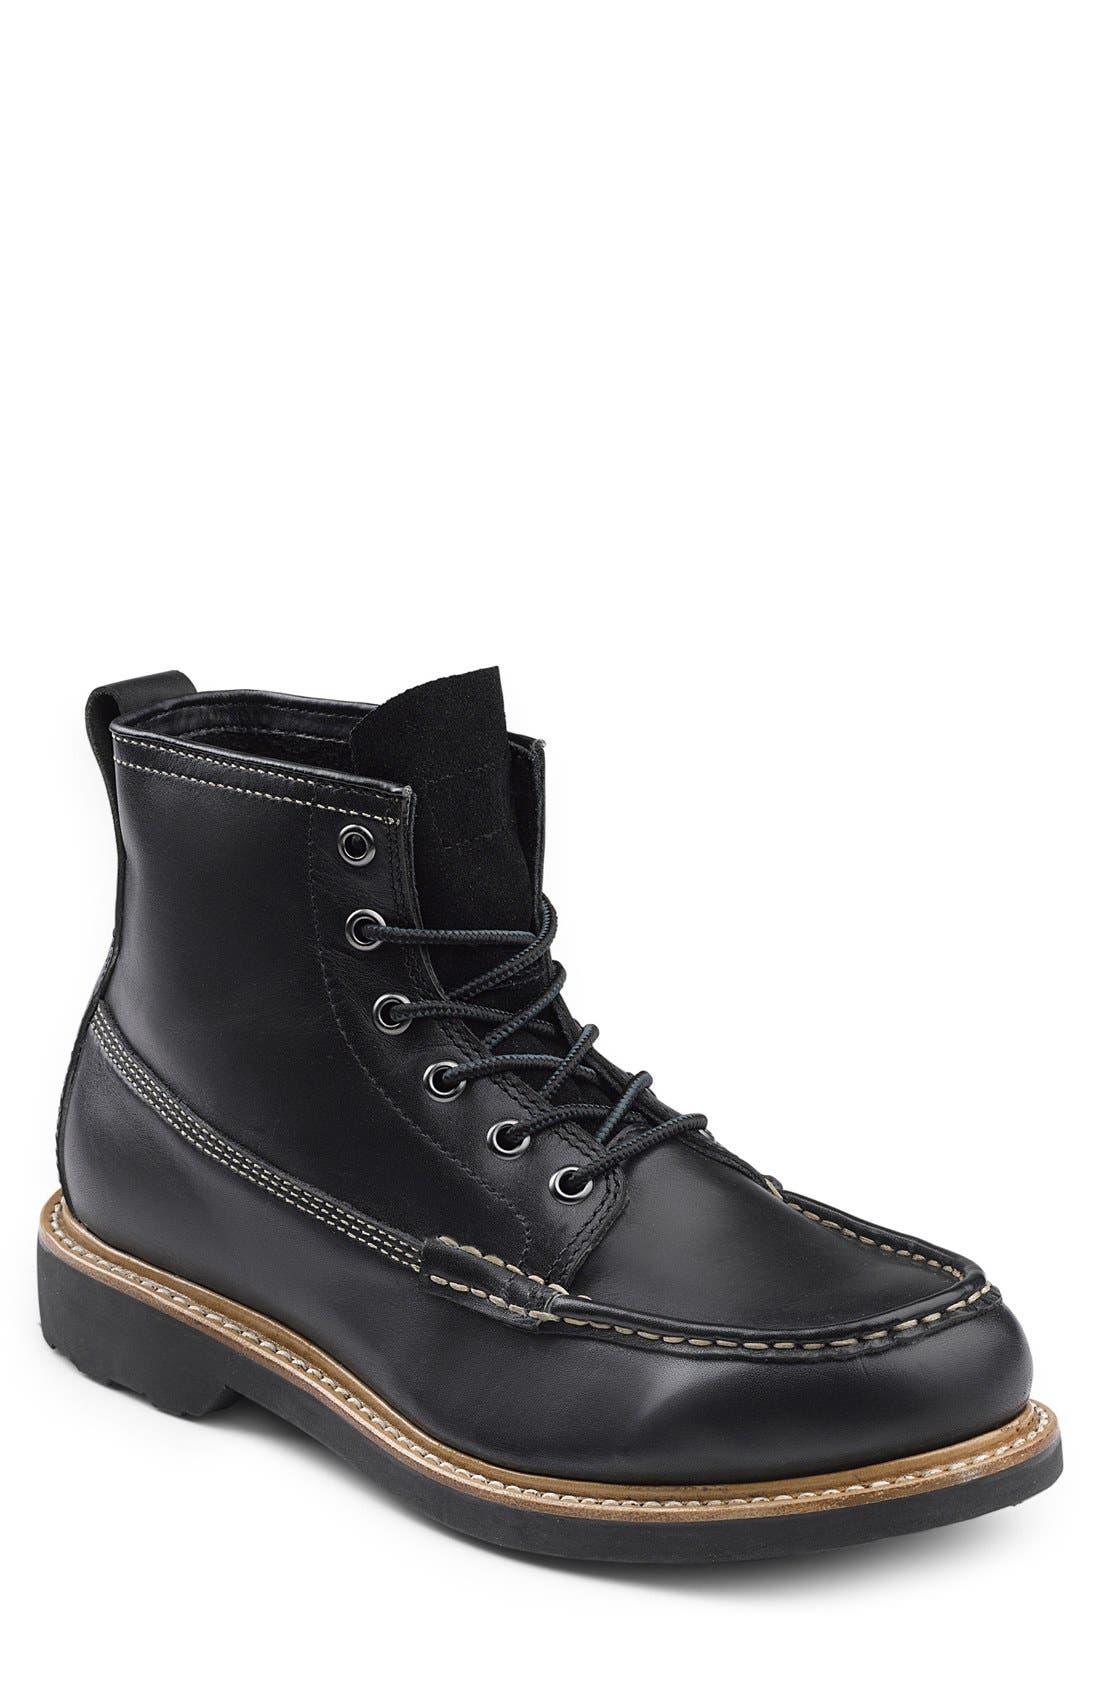 Main Image - G.H. Bass & Co. 'Ashby' Moc Toe Boot (Men)